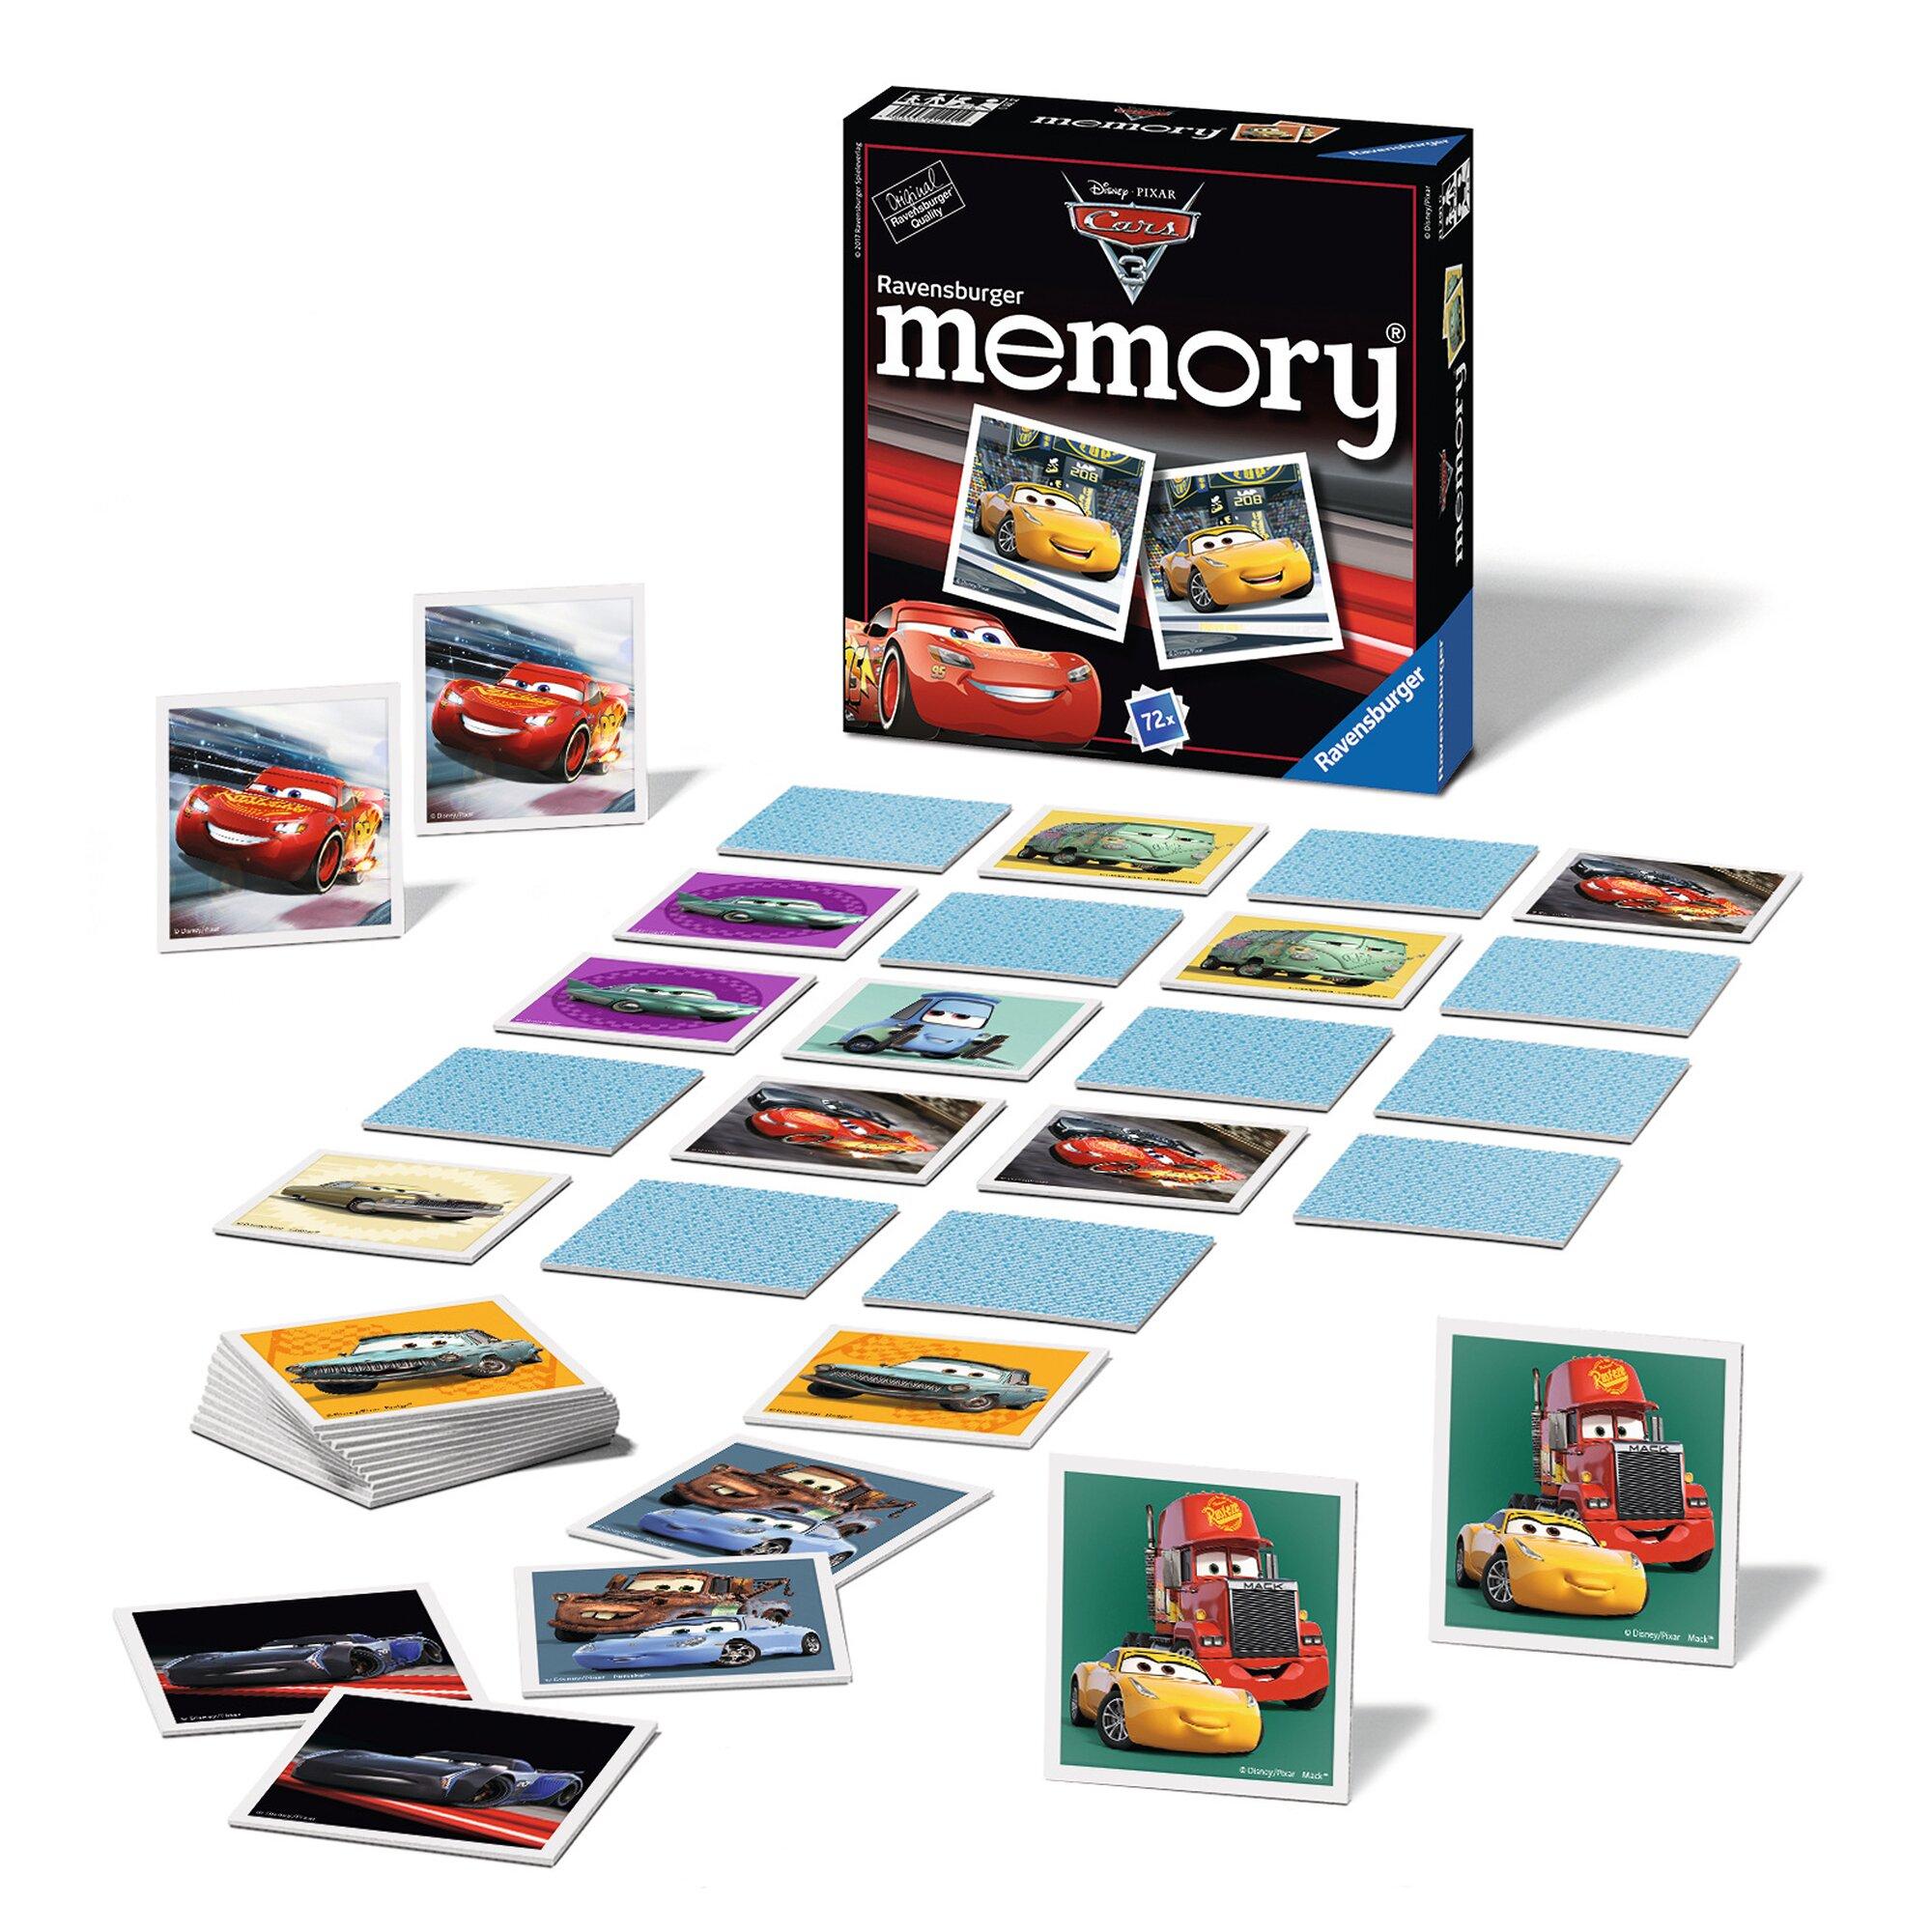 ravensburger-disney-pixar-cars-3-memory-legekartenspiel